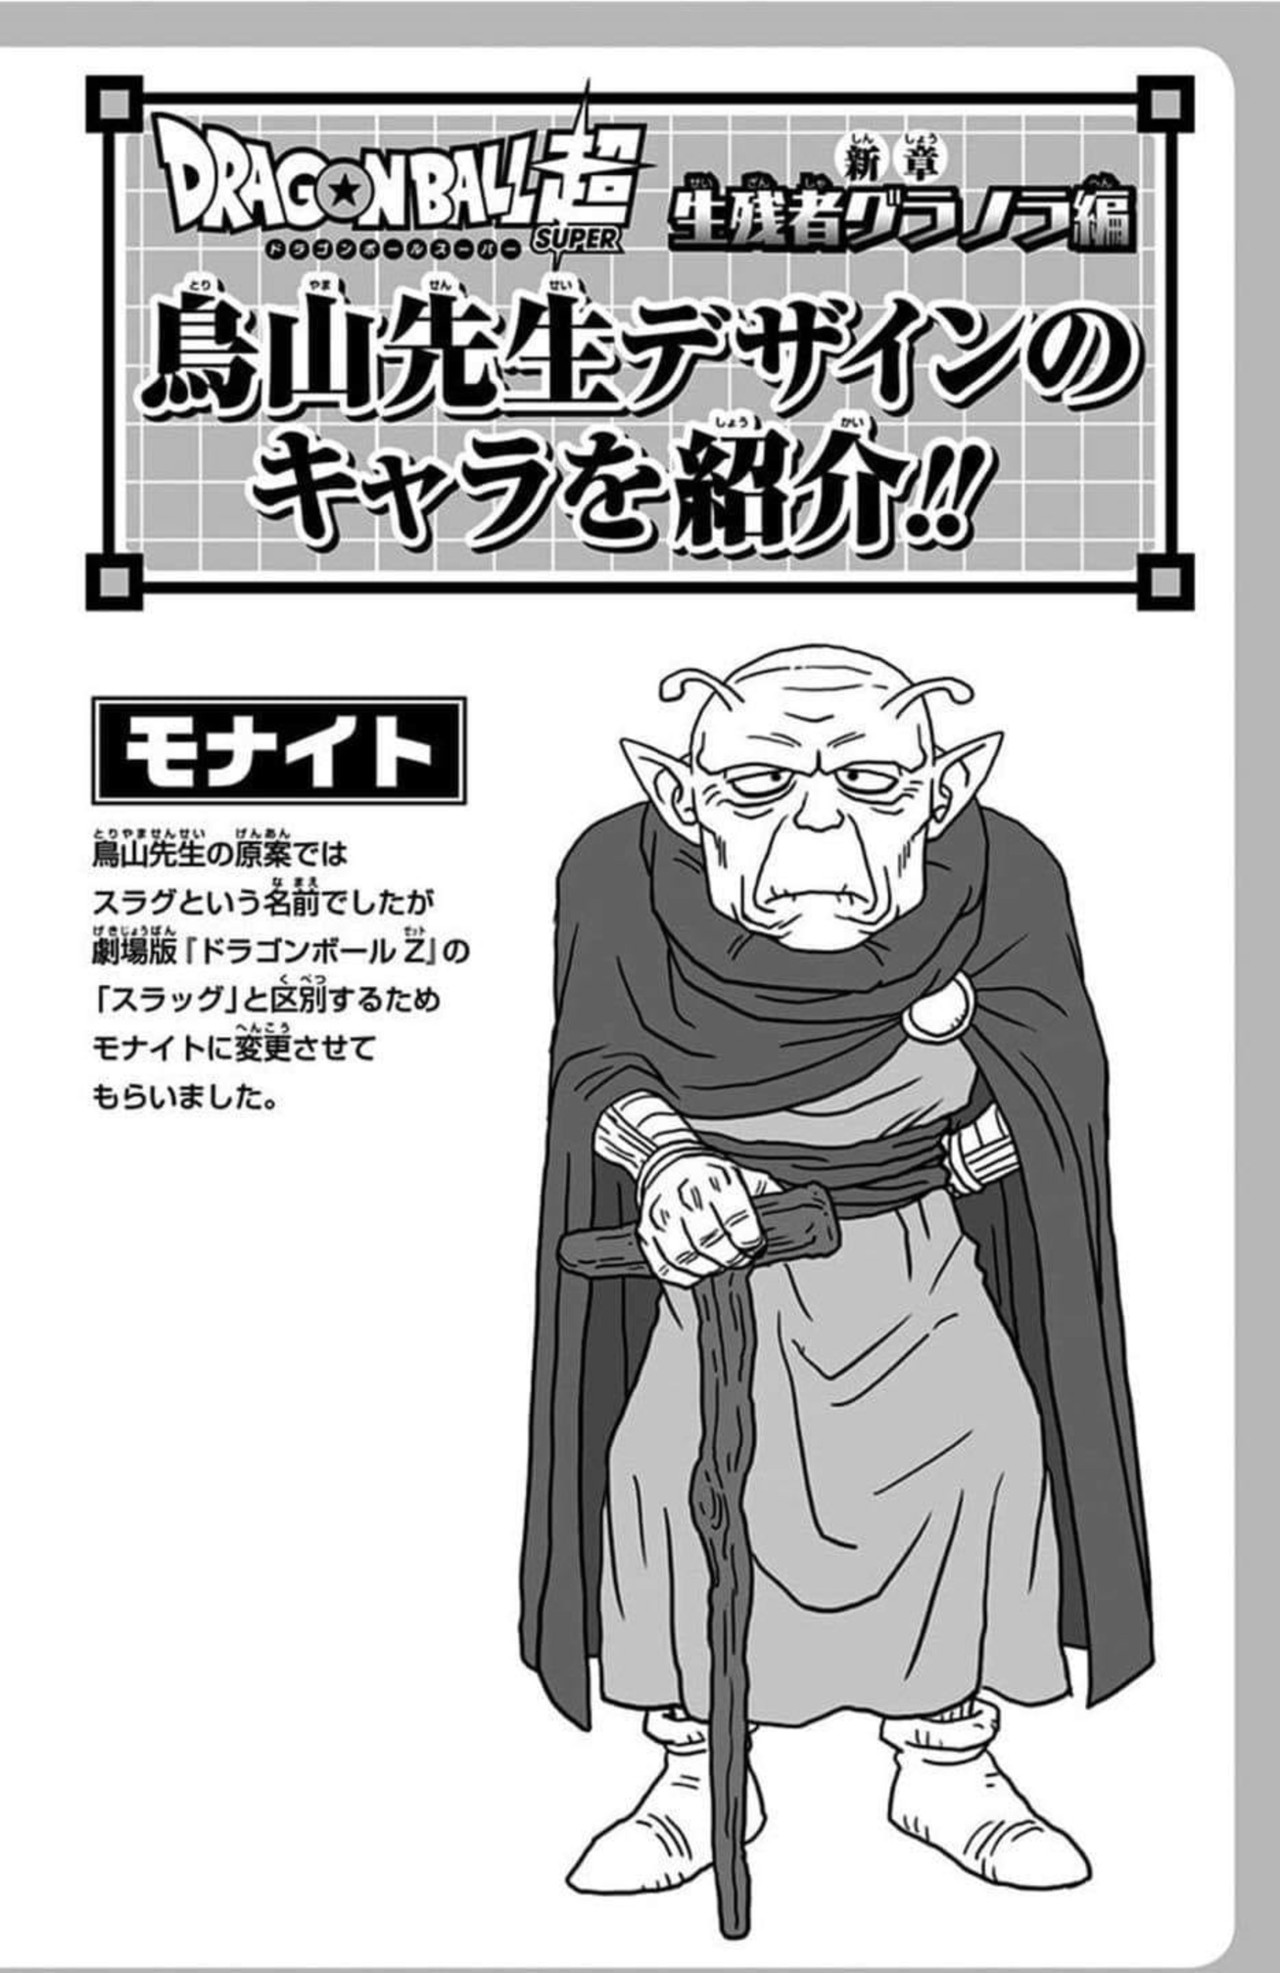 Personajes de Dragon Ball Super manga - Monaito